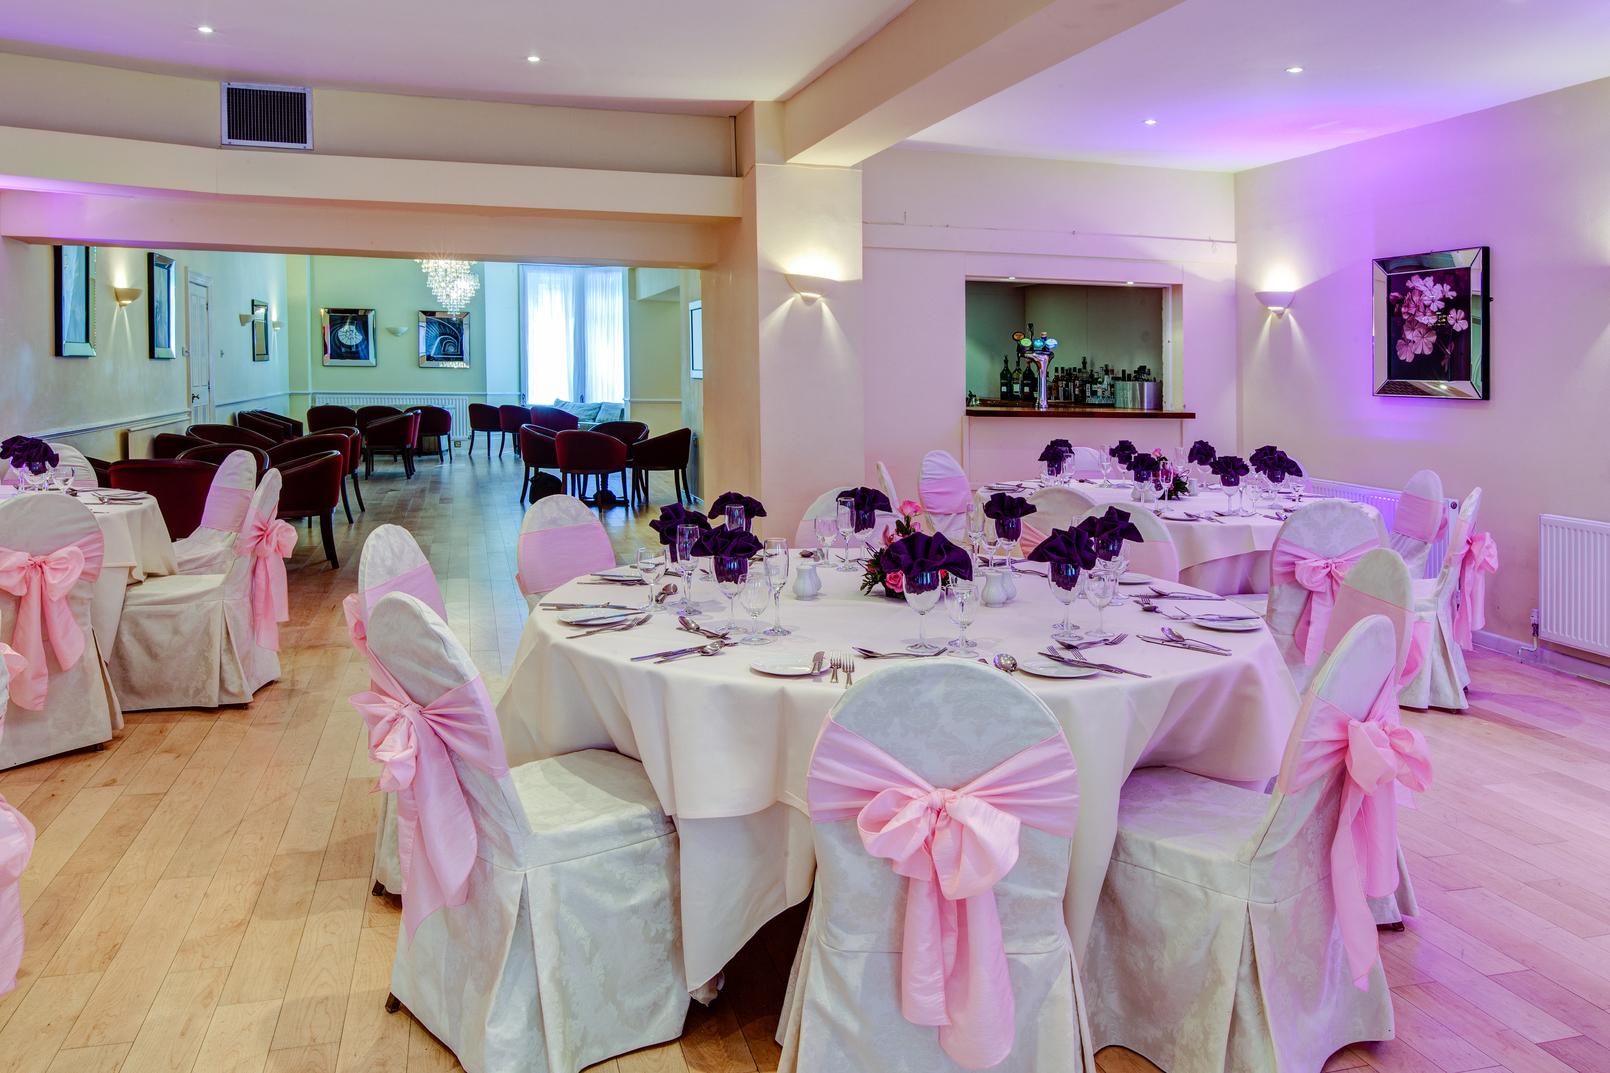 Wedding venues in surrey quays tesco